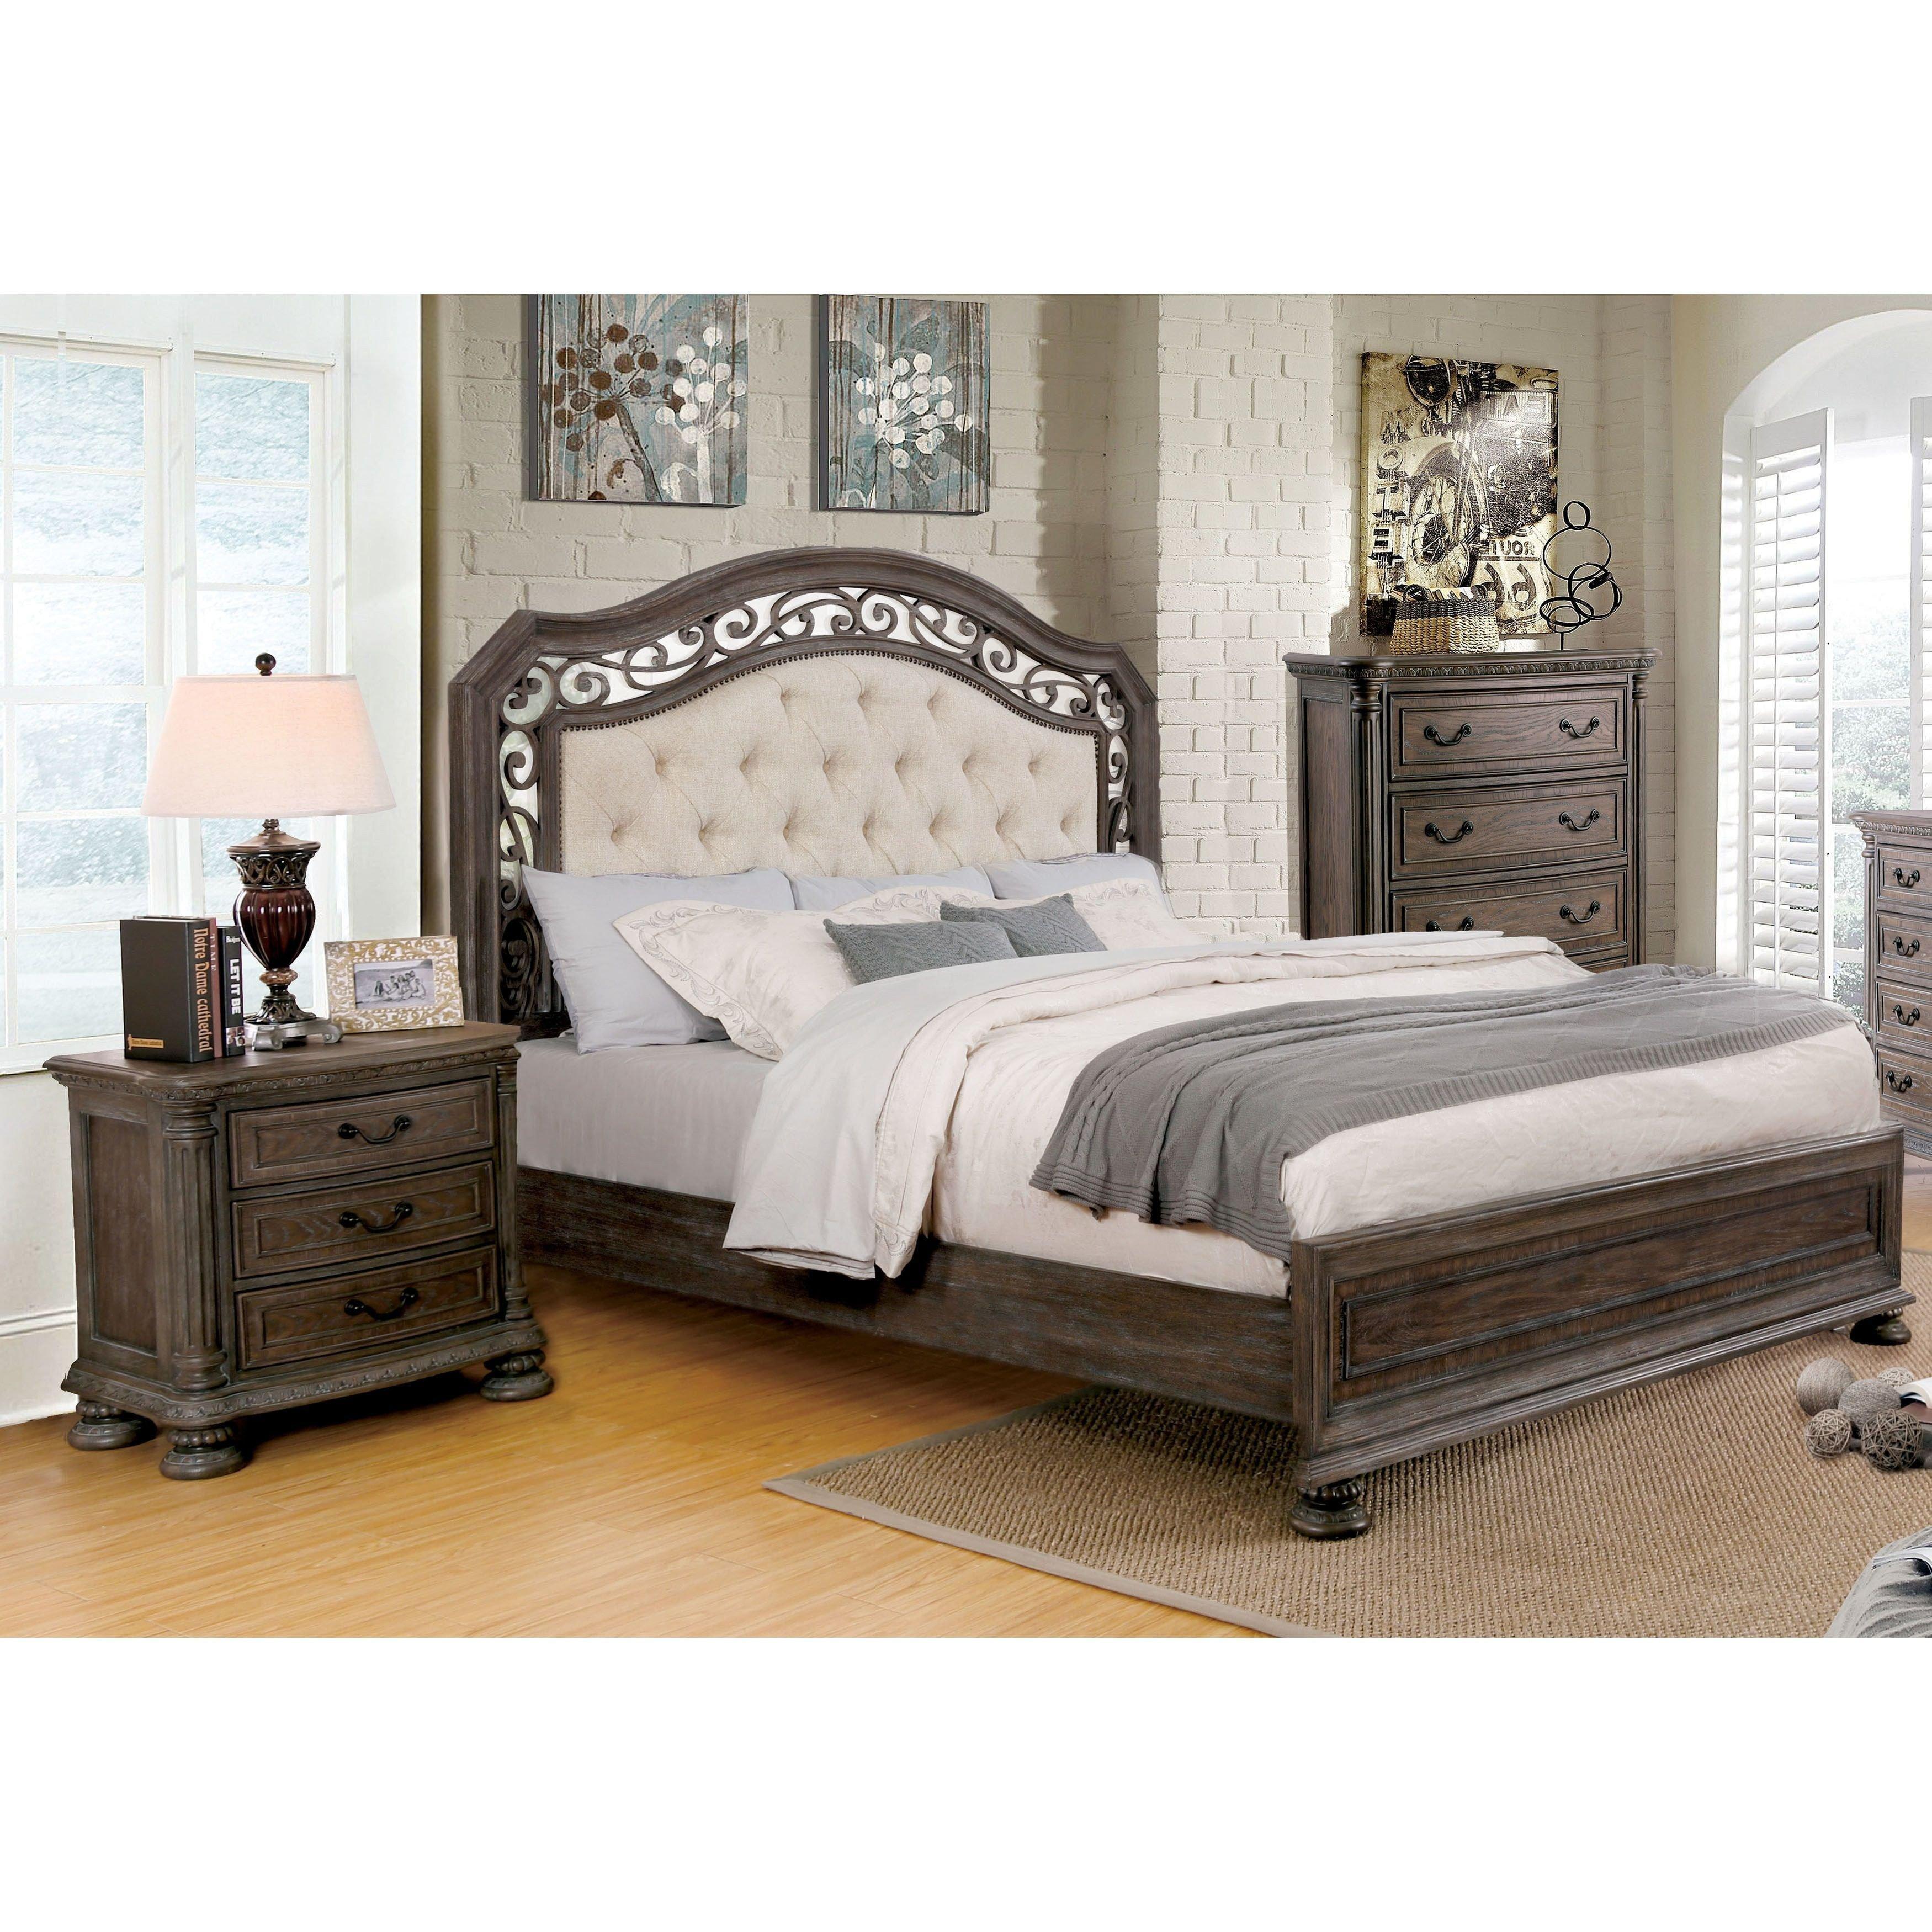 Cheap Bedroom Set Online Fresh Furniture Of America Brez Traditional Brown 3 Piece Bedroom